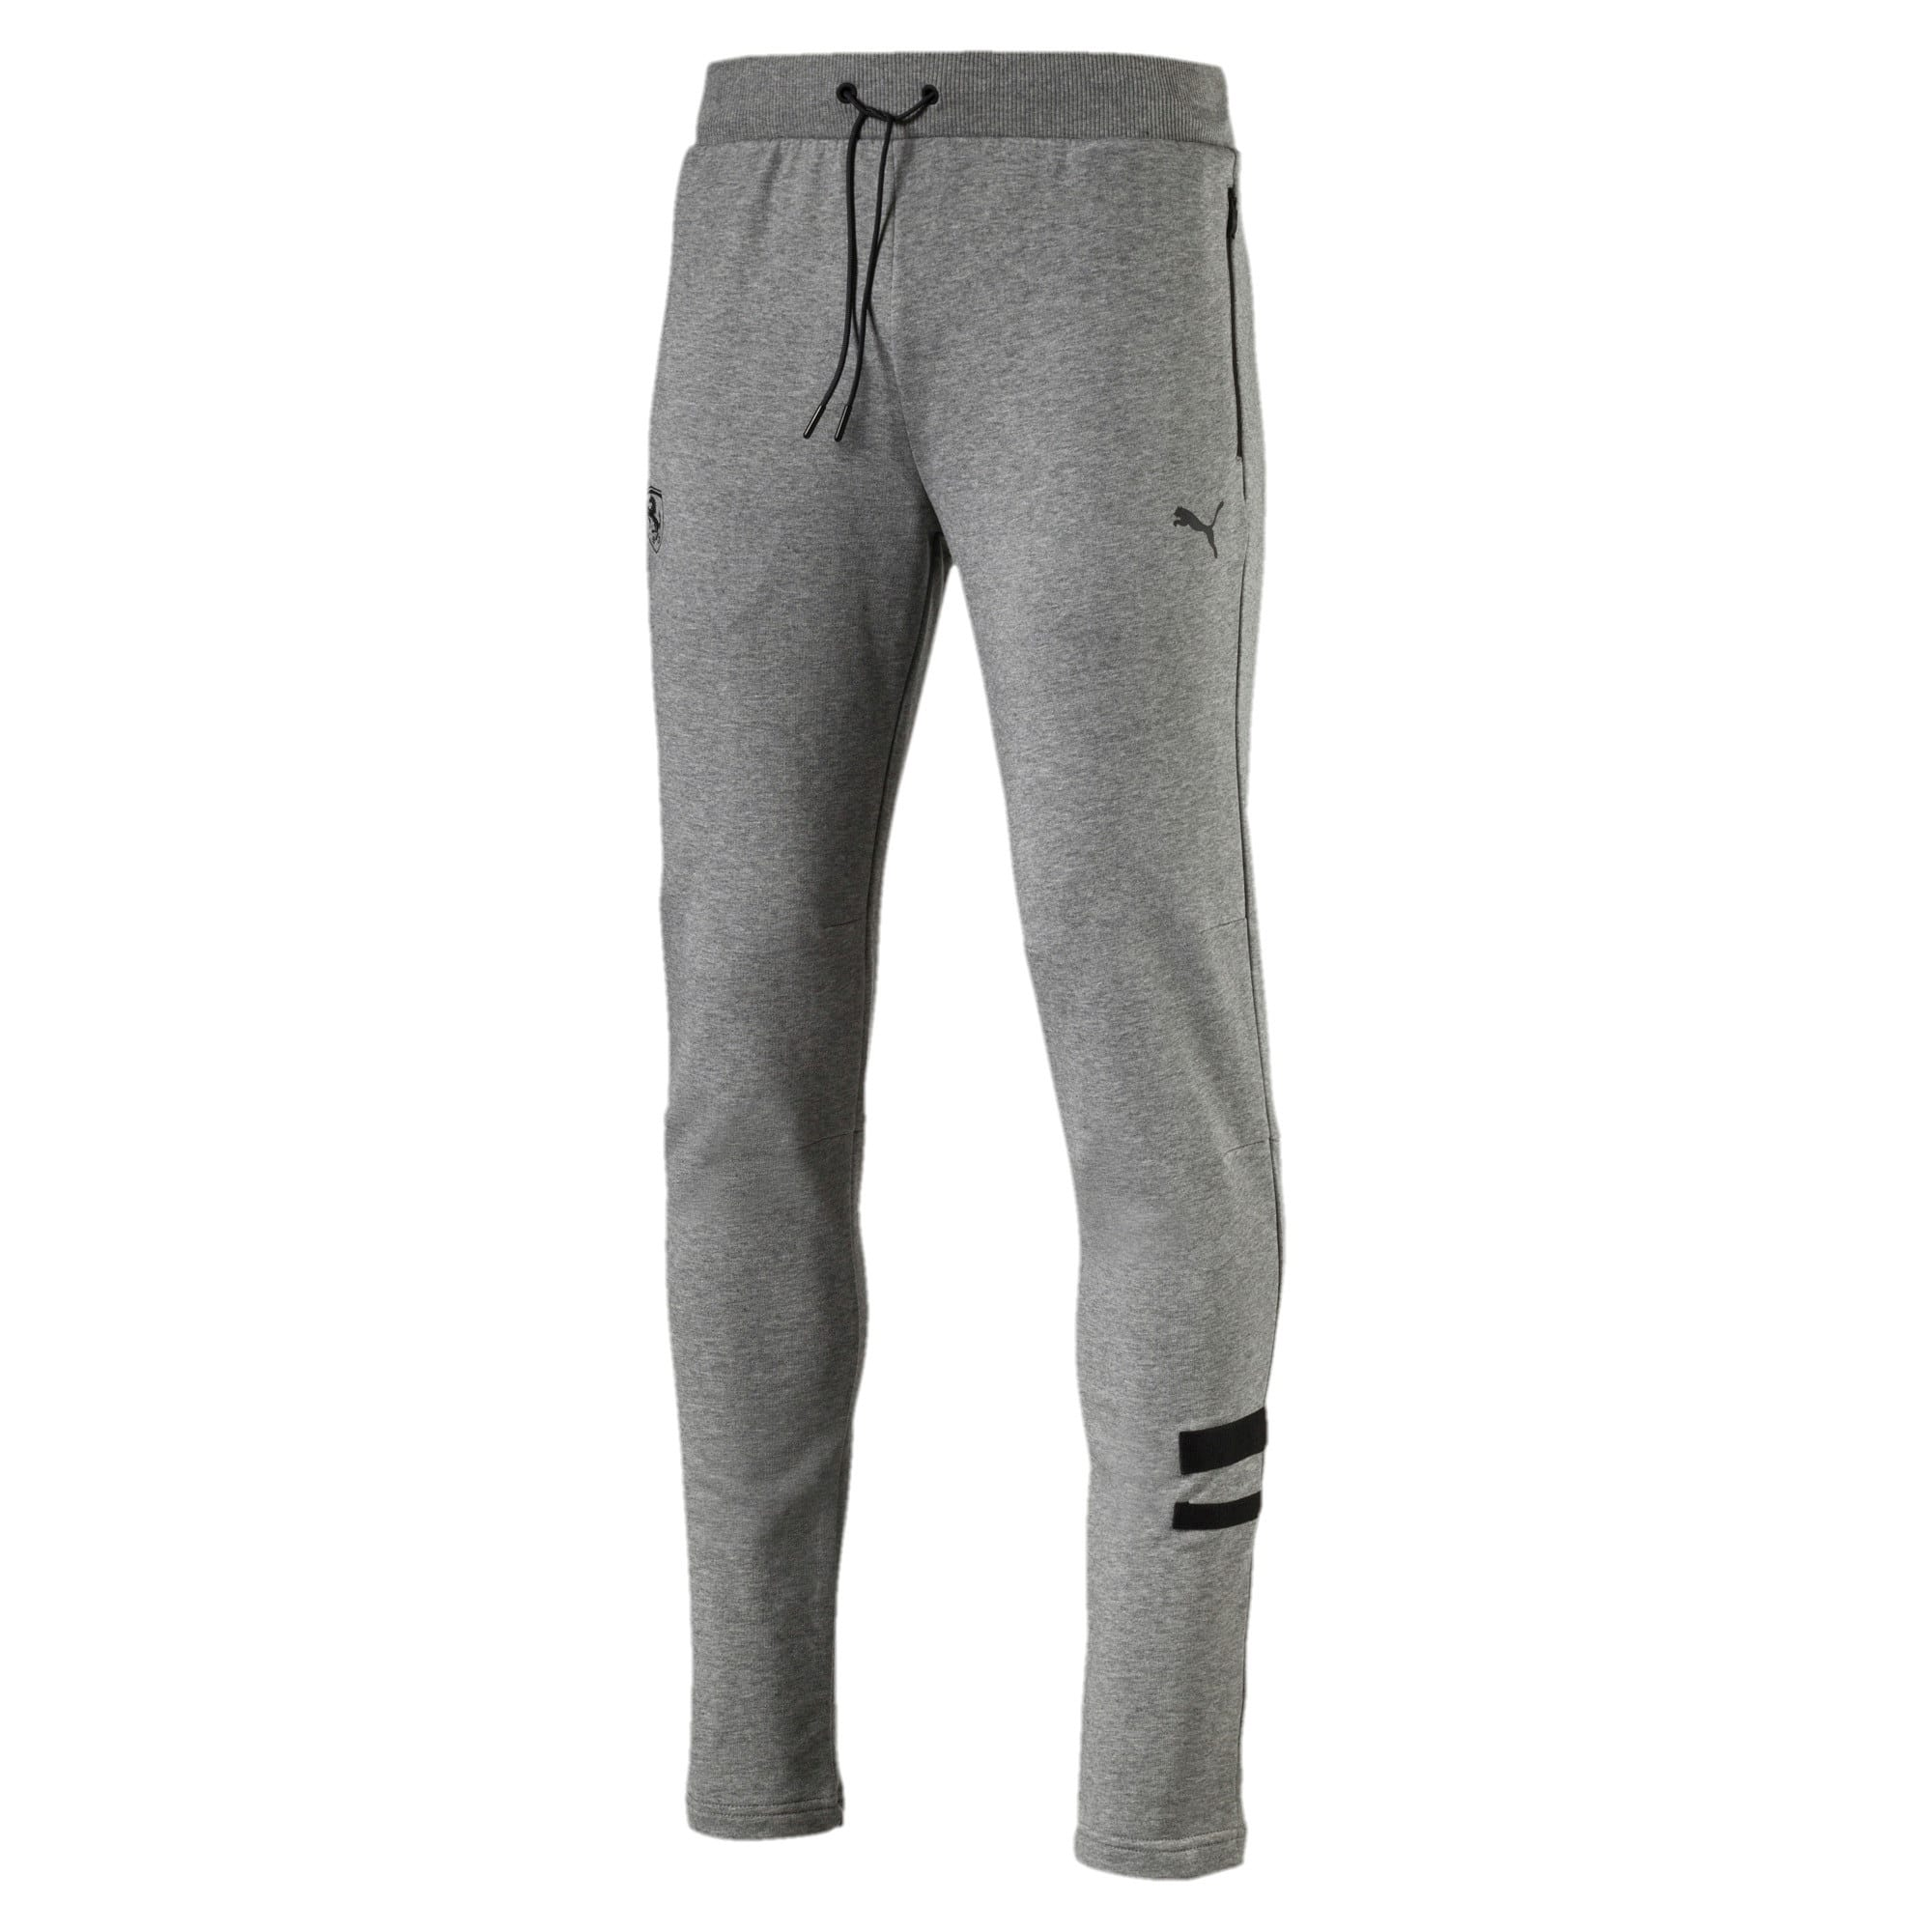 Thumbnail 4 of Ferrari Lifestyle Men's Sweatpants, Medium Gray Heather, medium-IND